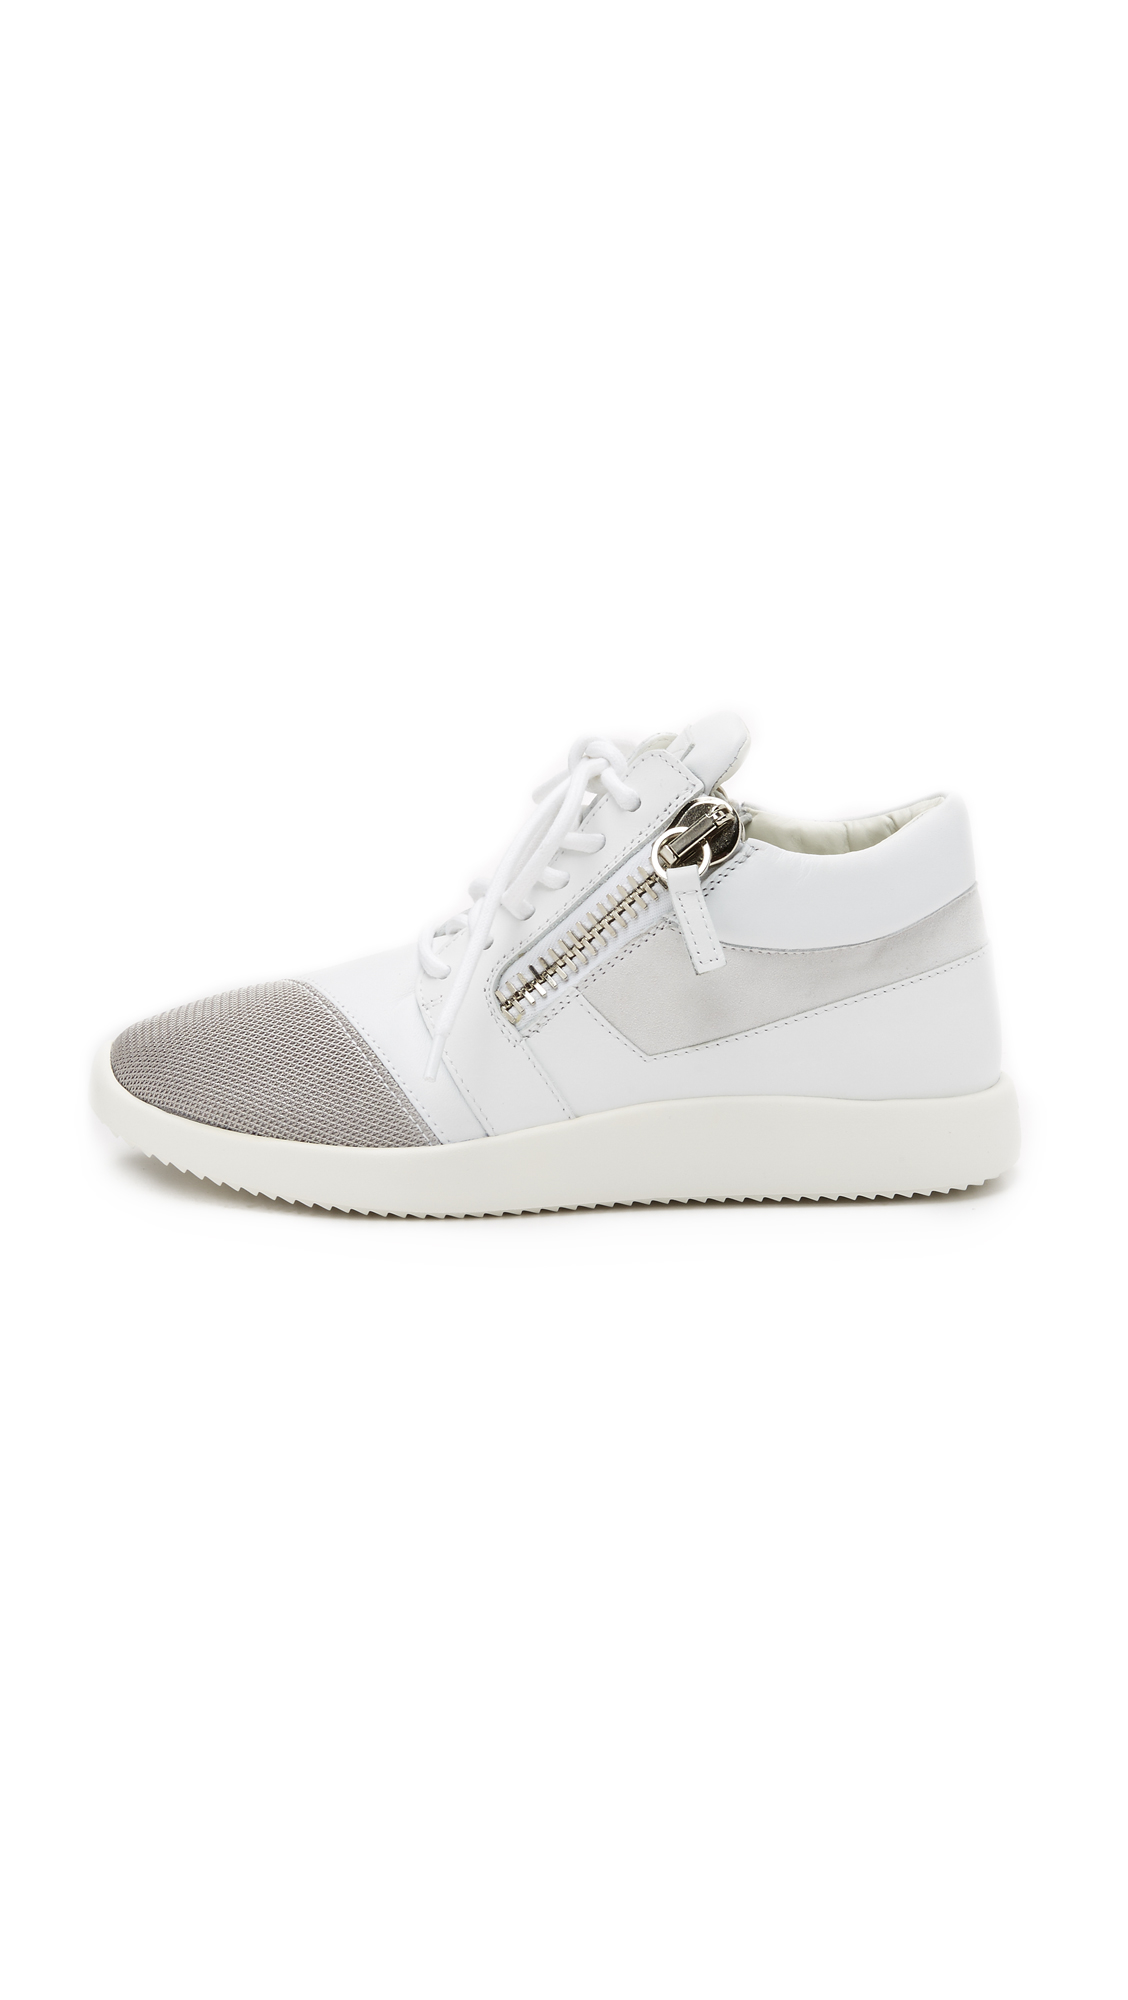 giuseppe zanotti sneakers in white lyst